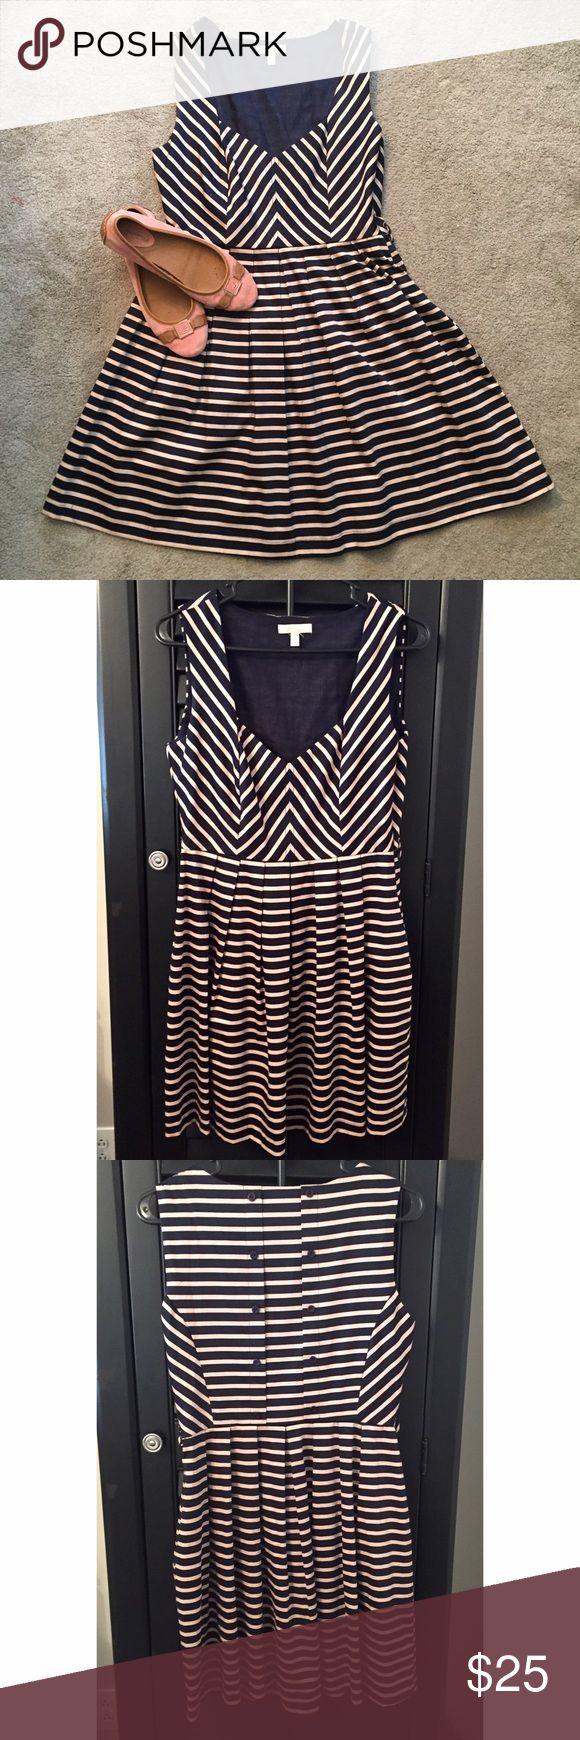 NWOT Monteau Striped Cocktail Dress NWOT Monteau Striped Dress • Navy and Cream Stripe • Sweetheart neckline • Full skirt • Size M • New, Never Worn Monteau Dresses Mini